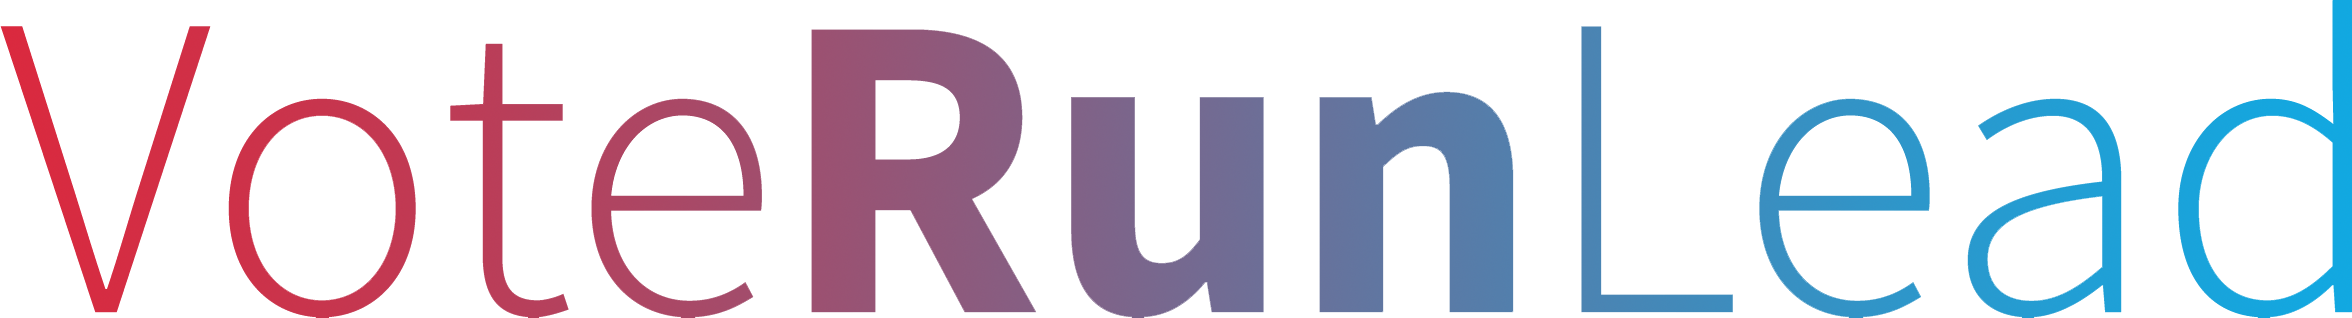 VoteRunLead Logo Gradient RGB (5).png